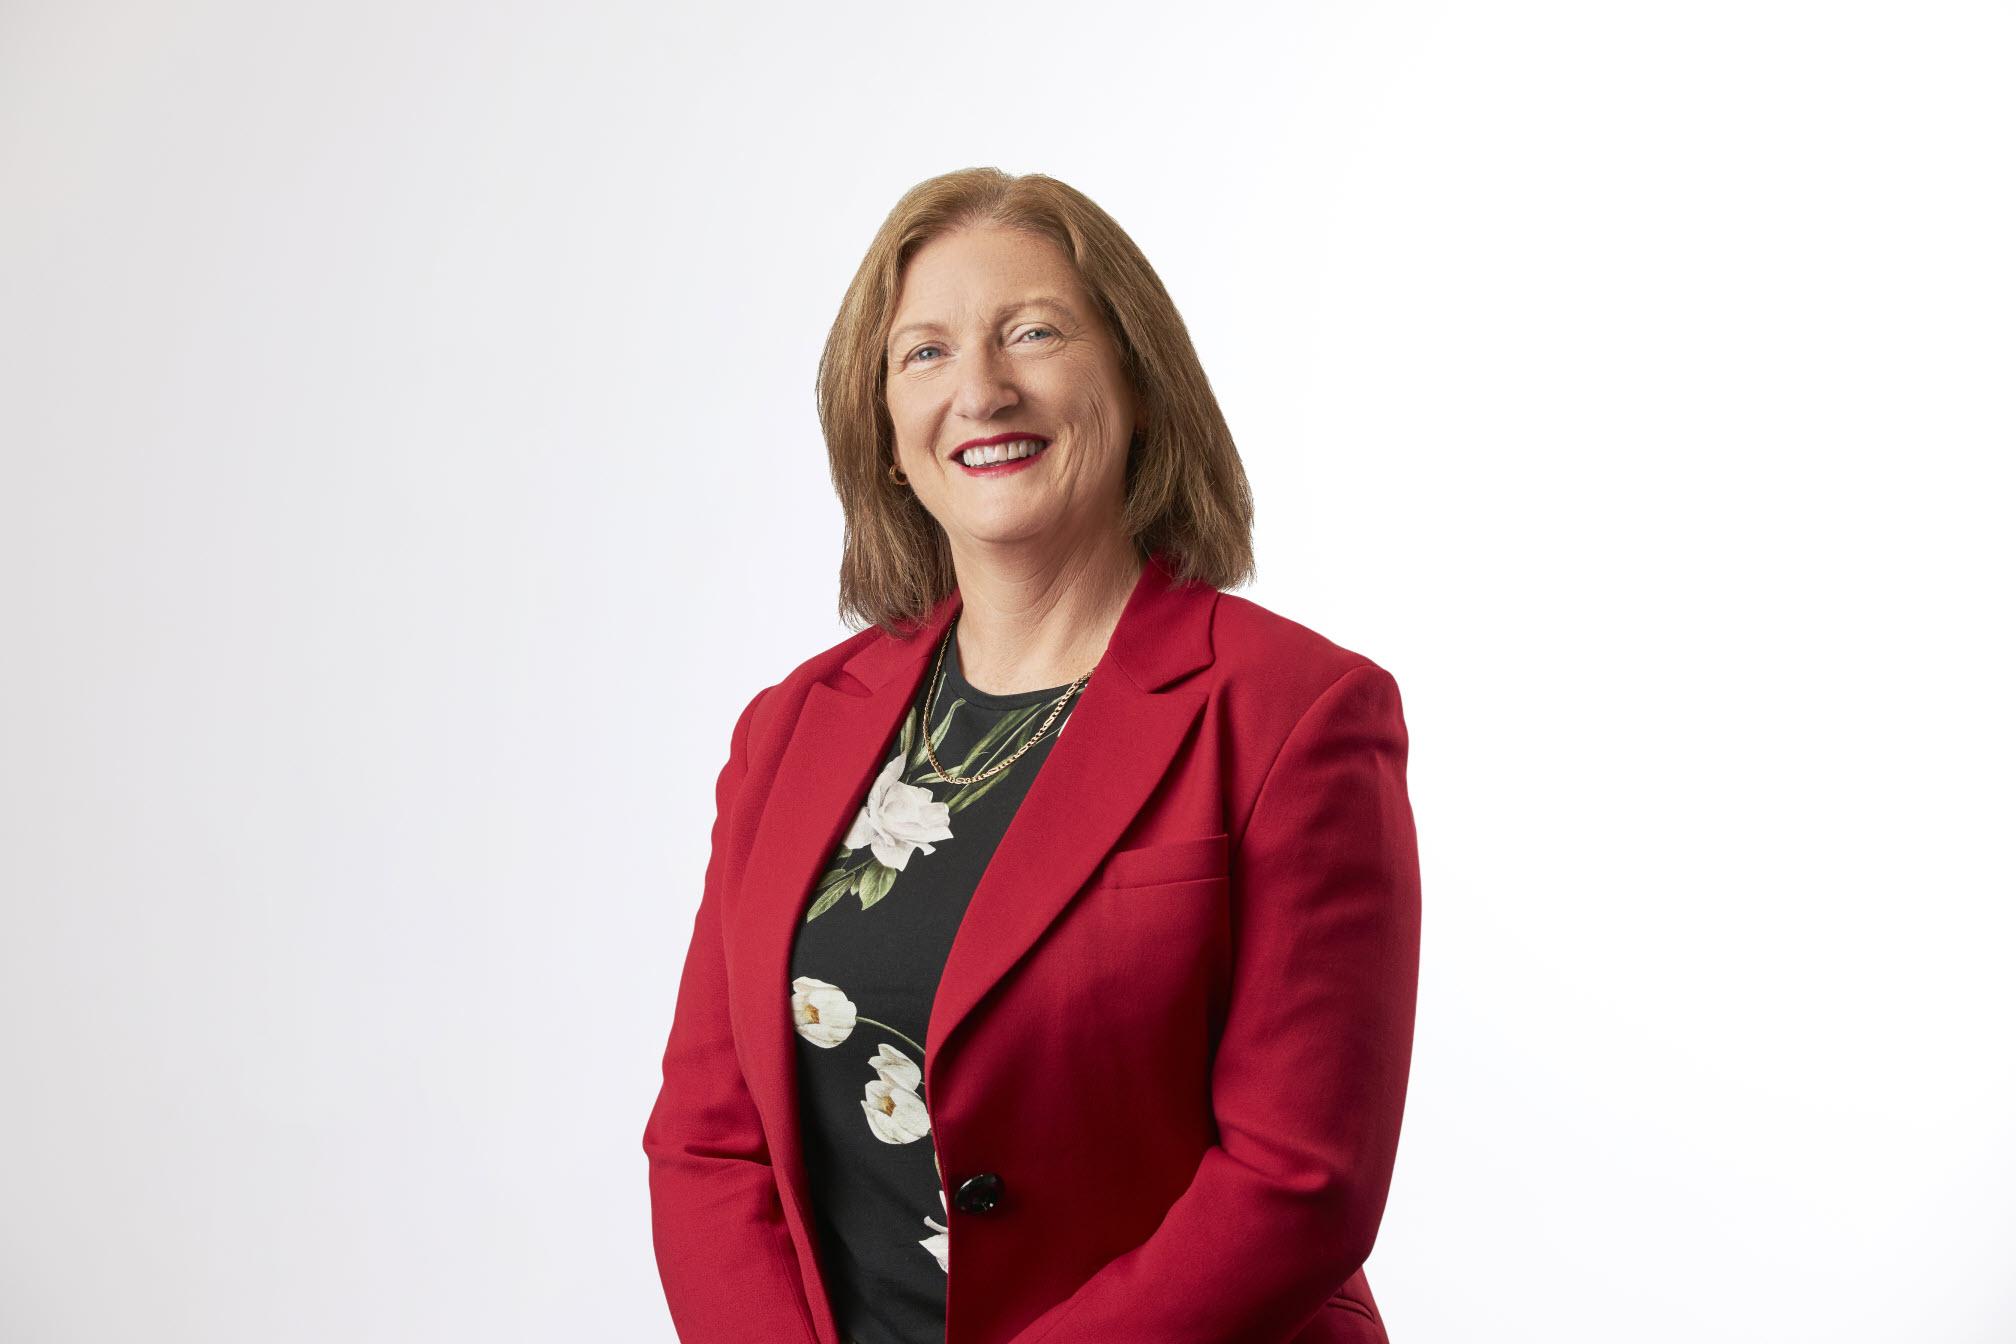 Karen Cusack